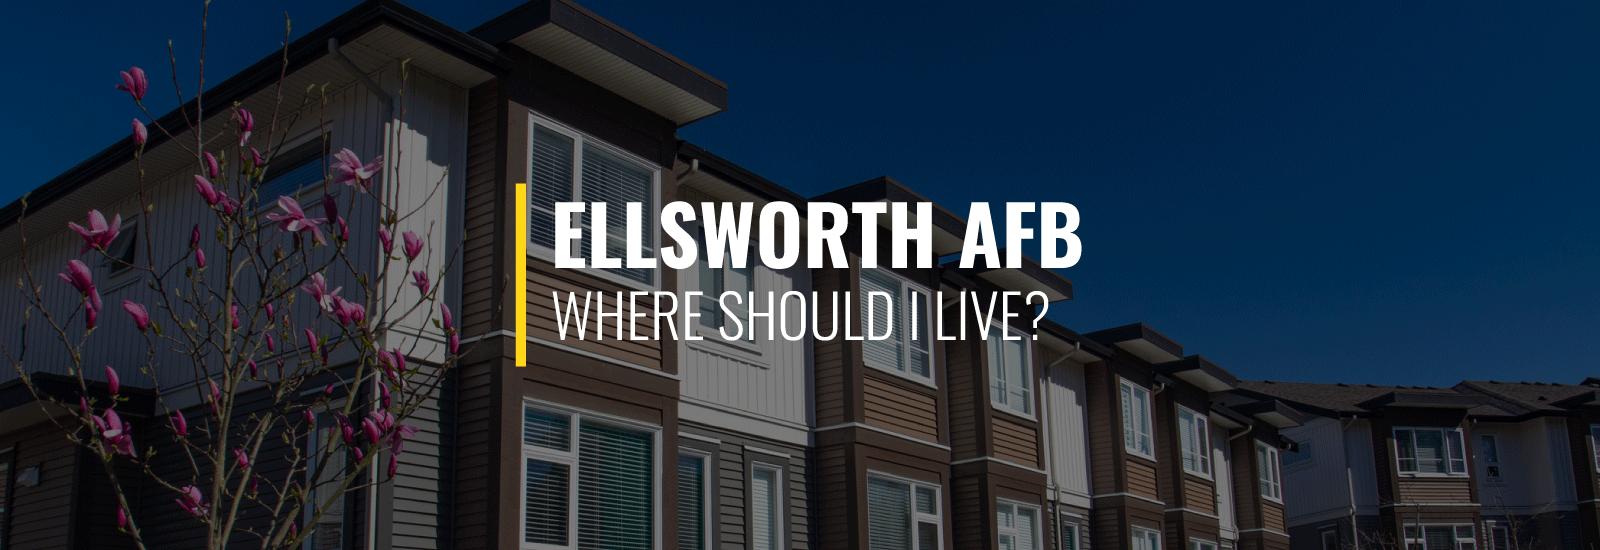 Where Should I Live Near Ellsworth Air Force Base?